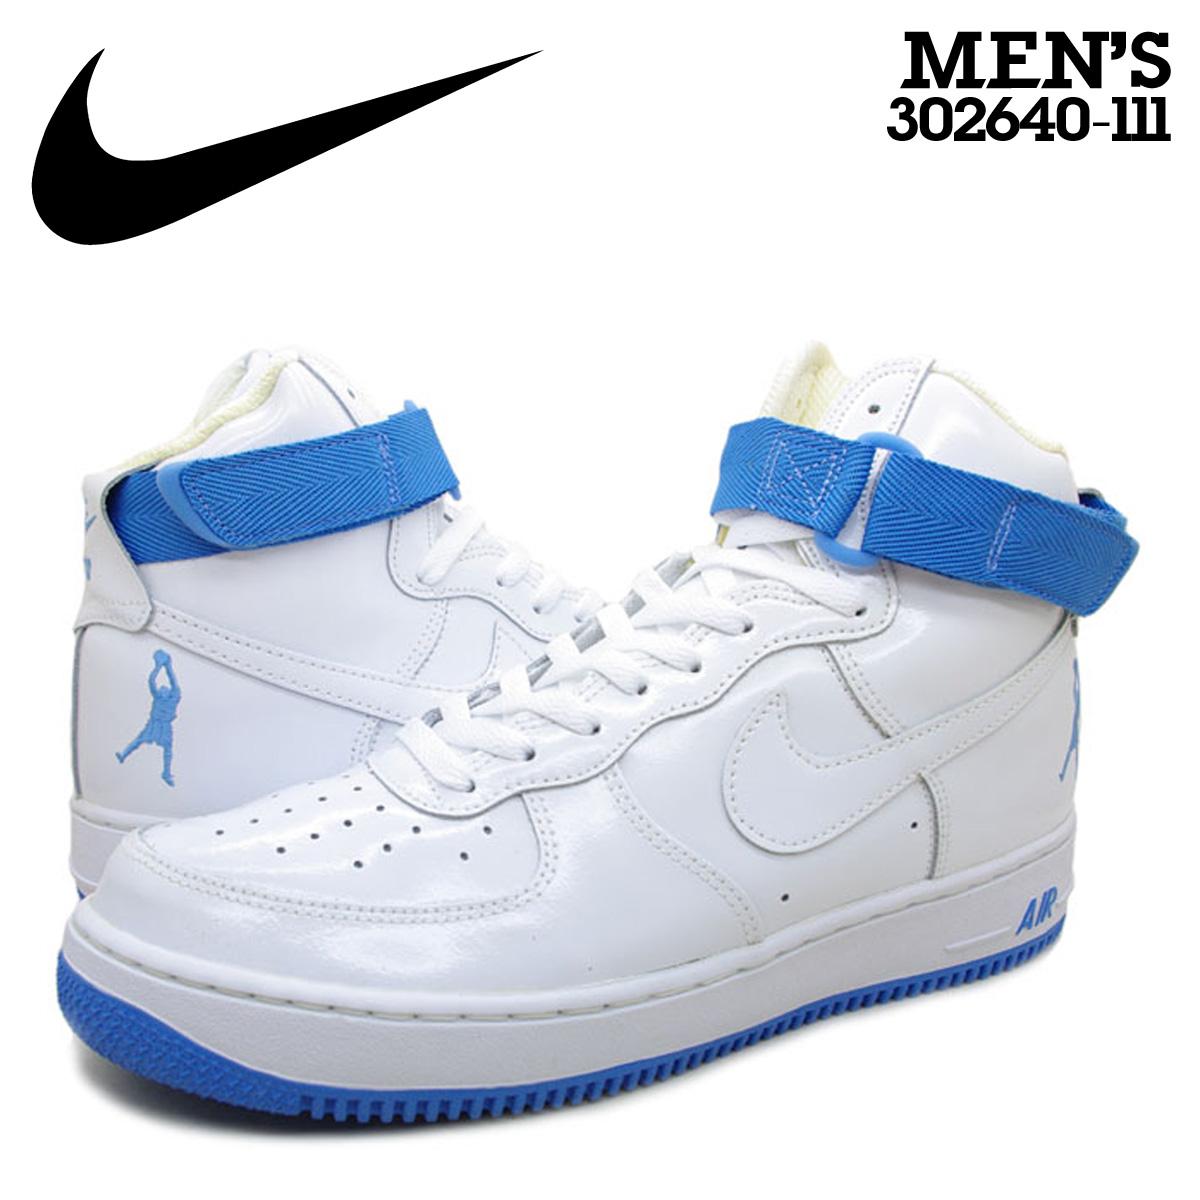 6c2ddcc6ad8f79 Nike NIKE air force sneakers AIR FORCE 1 HIGH